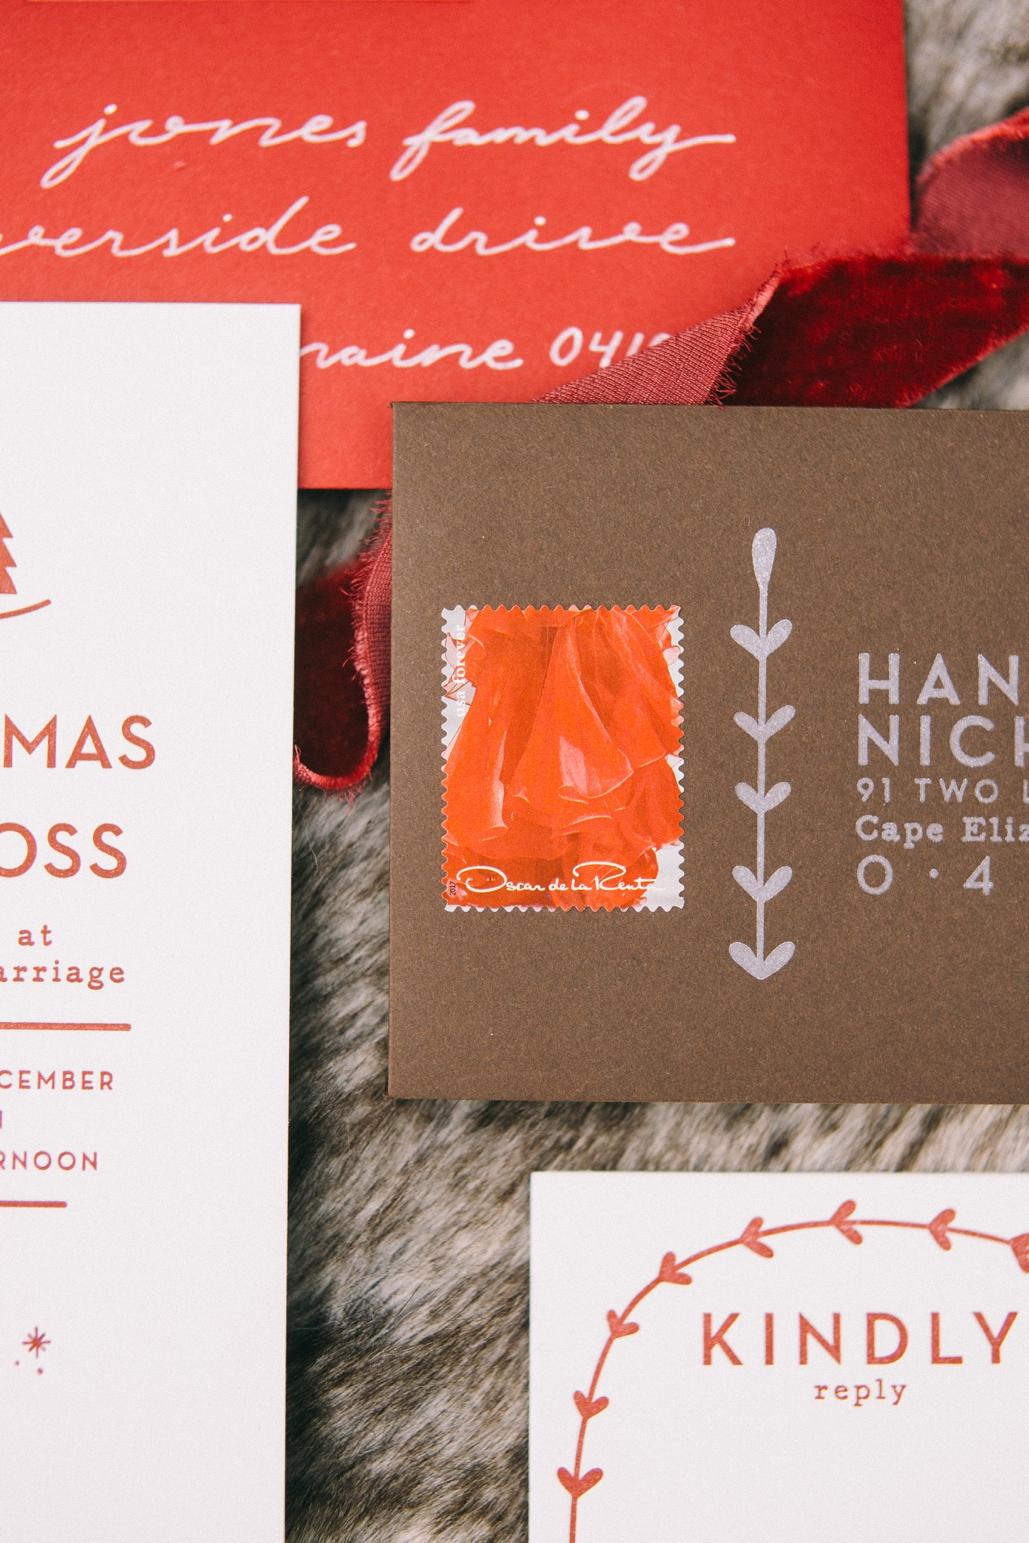 unique rsvp cards and envelopes with stamps, letterpress printed envelopes custom made and designed